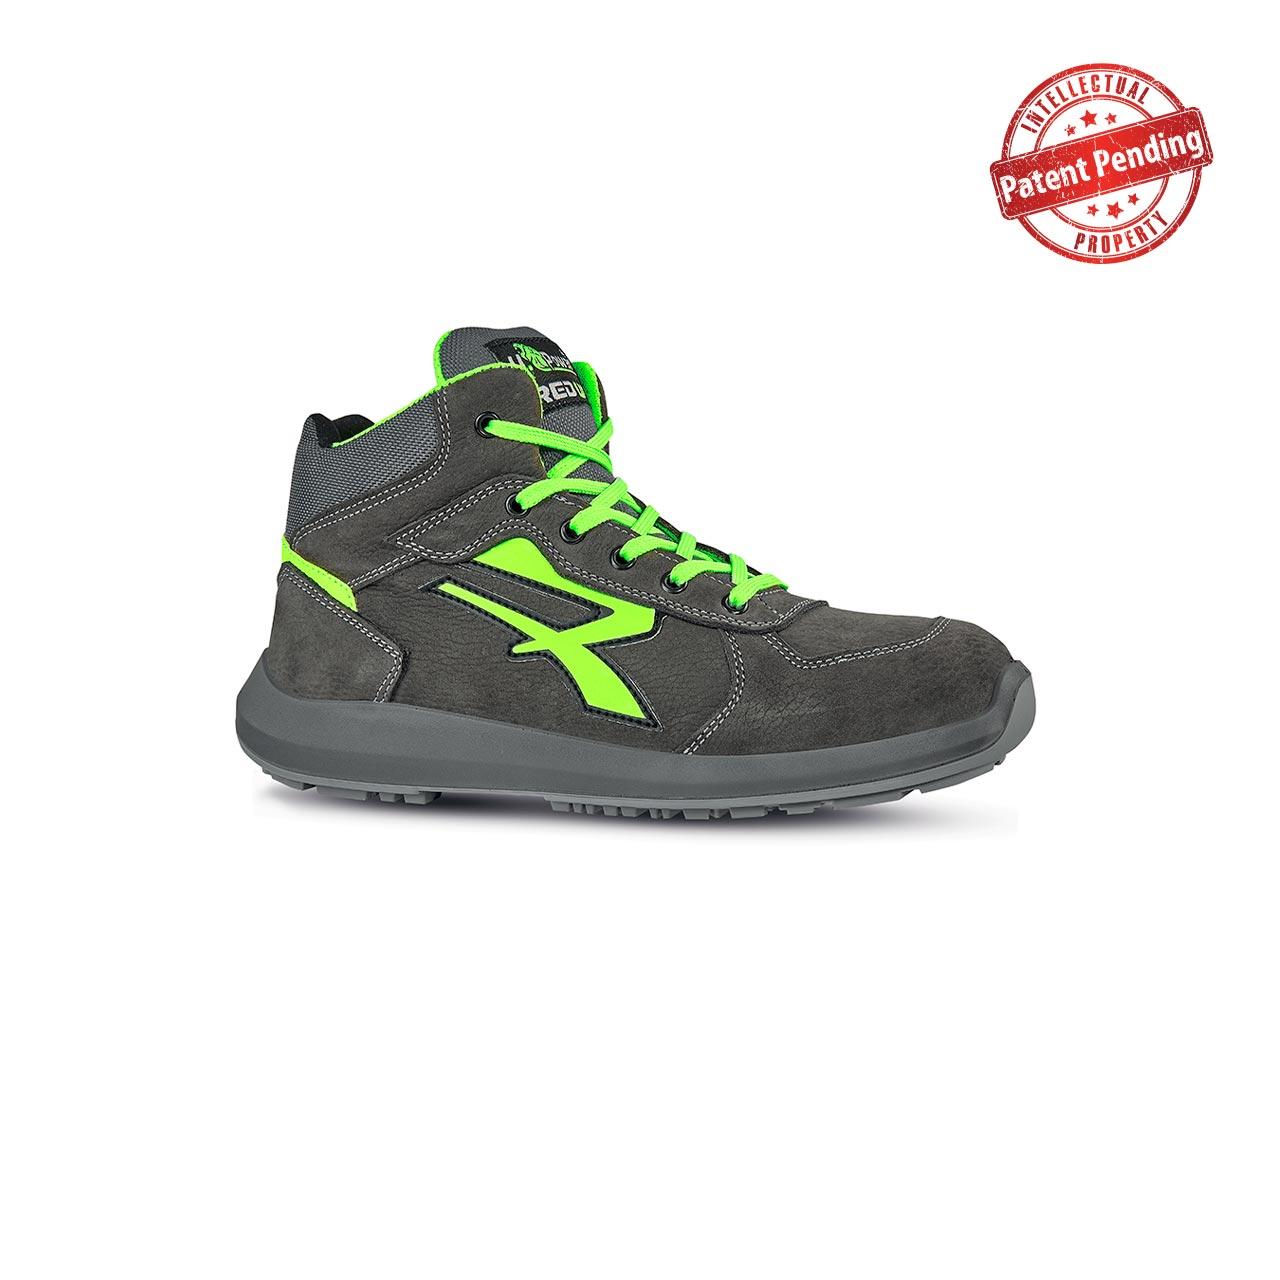 scarpa antinfortunistica alta upower modello aries linea redup vista laterale